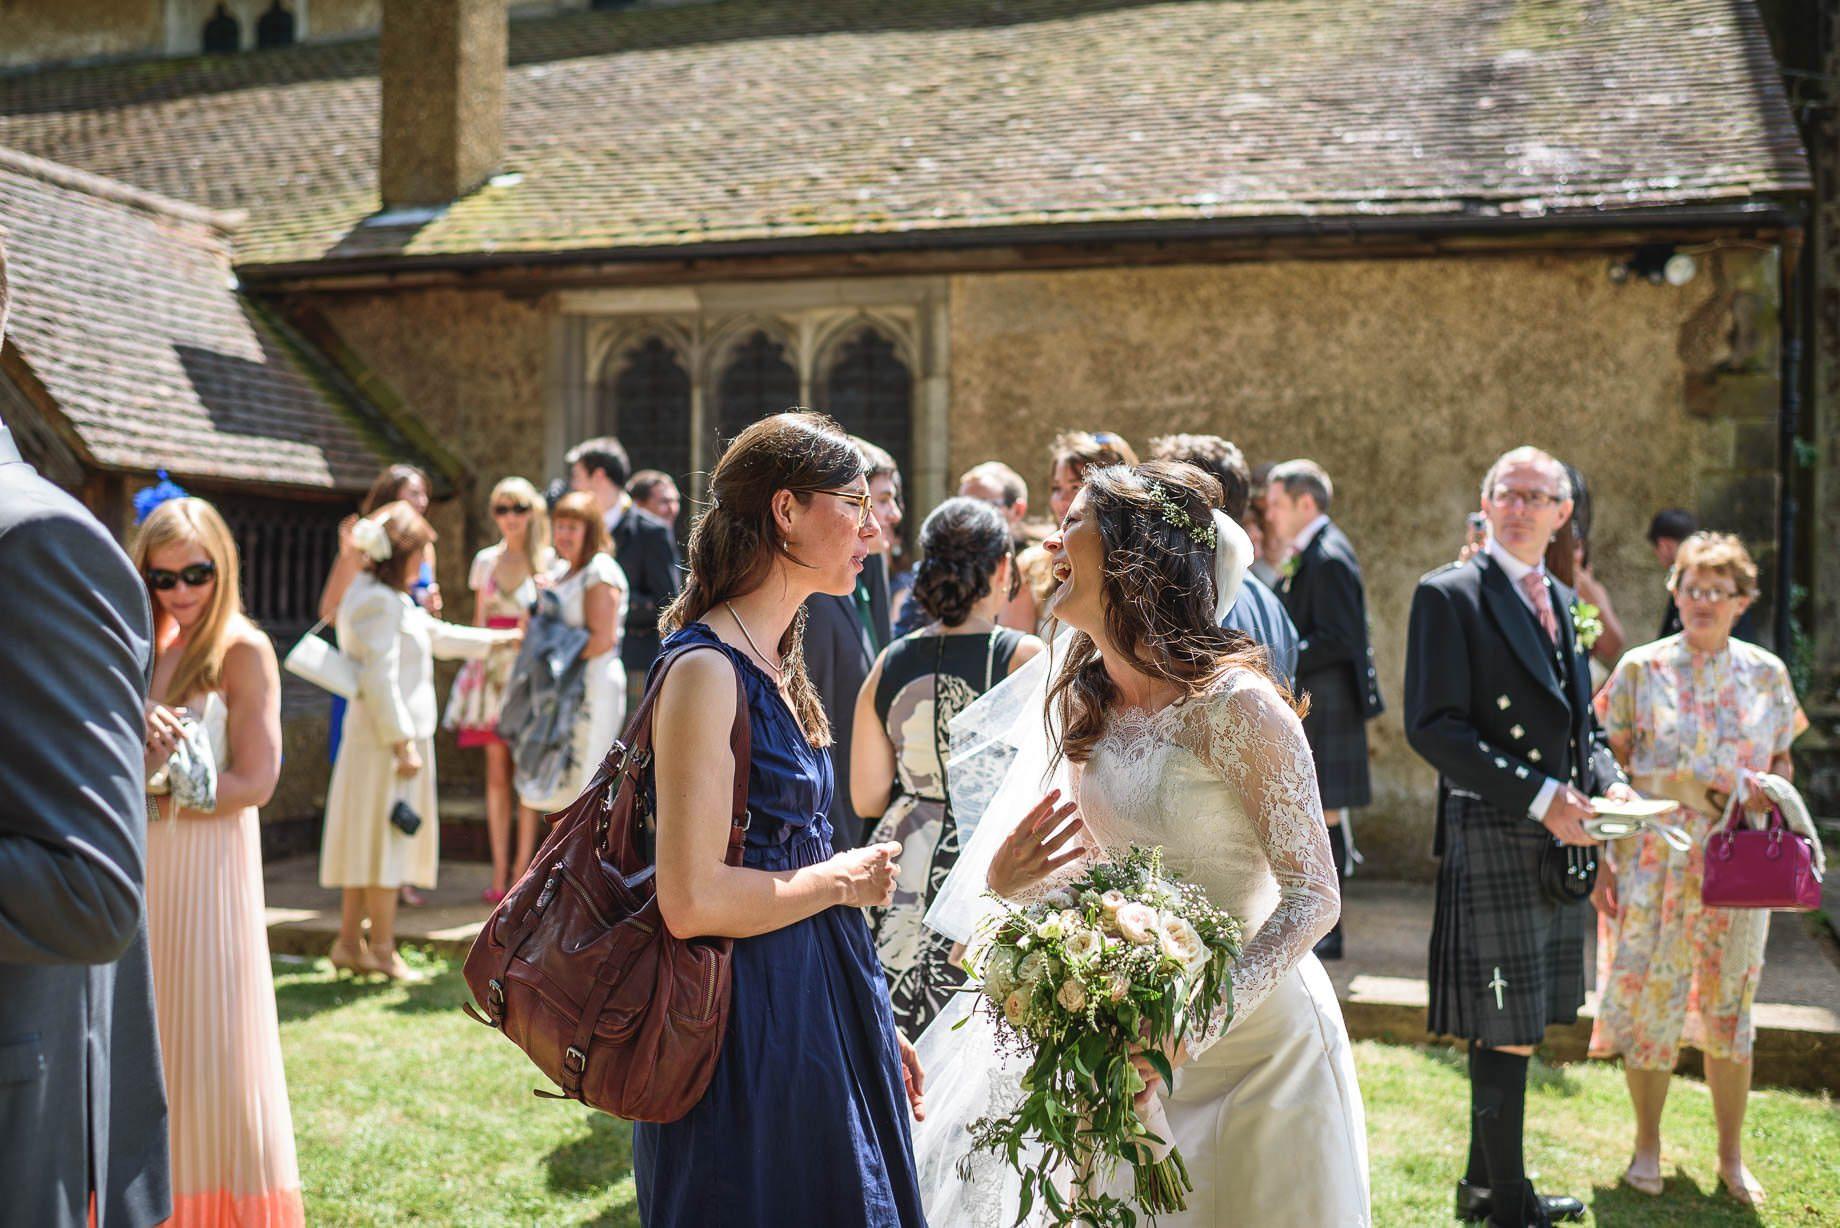 Gildings Barn wedding photography - Sarah and Steve (71 of 190)